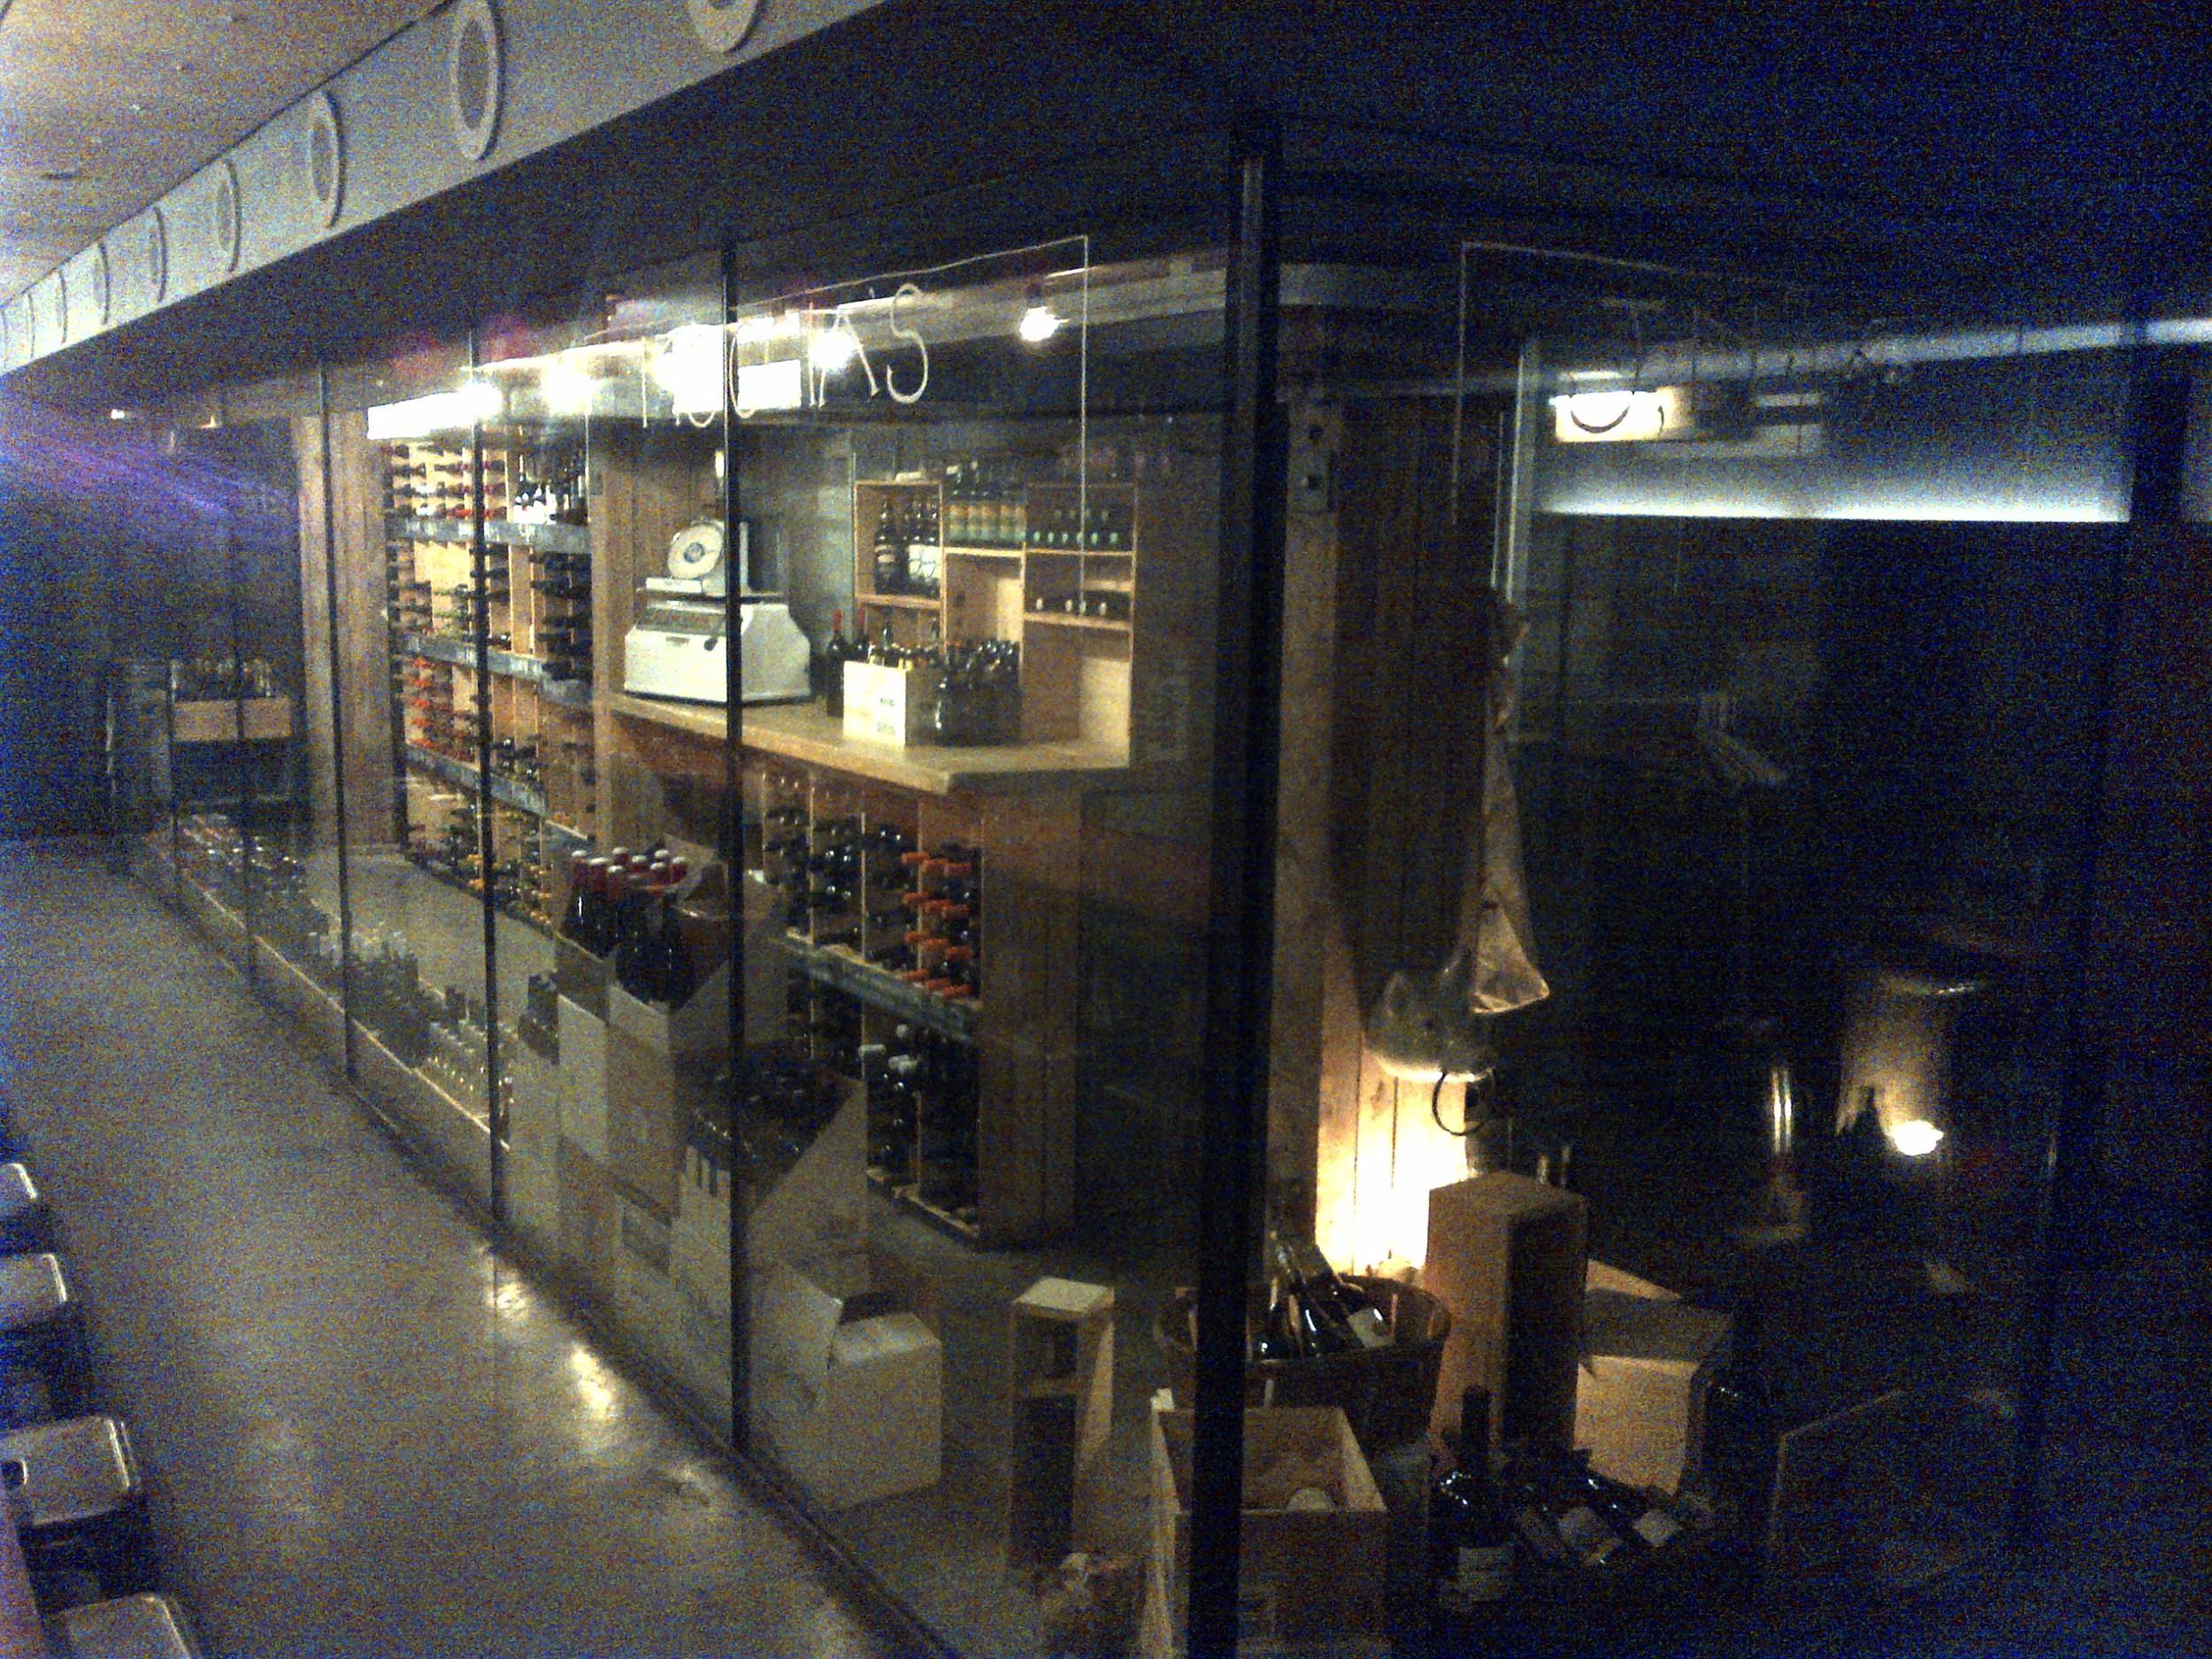 ...The adjacent wine cellar at Salt